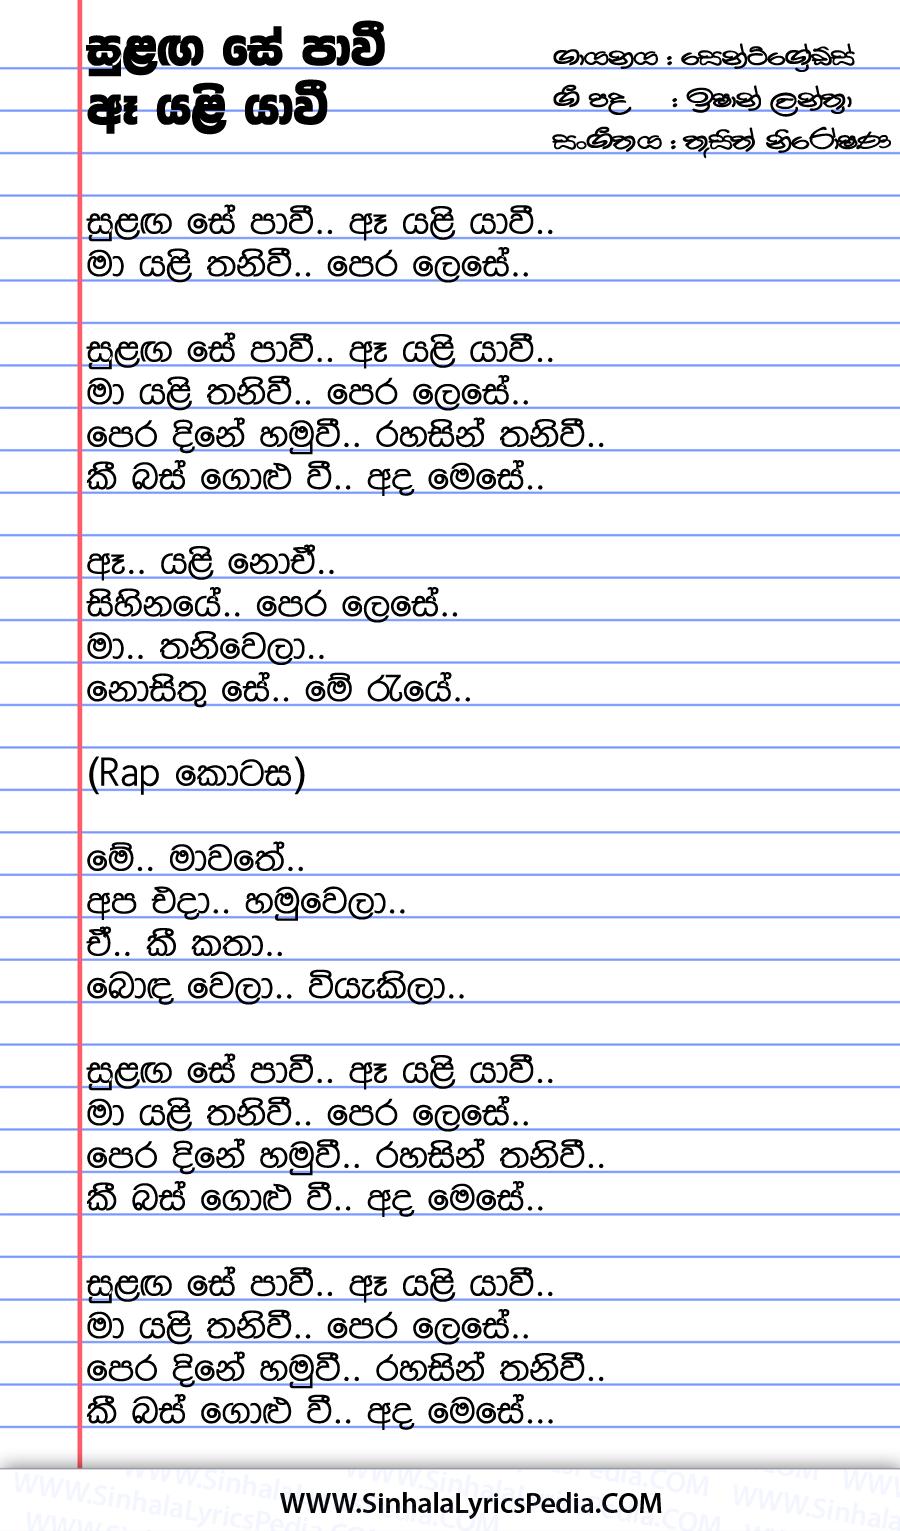 Sulanga Se Pawee Song Lyrics